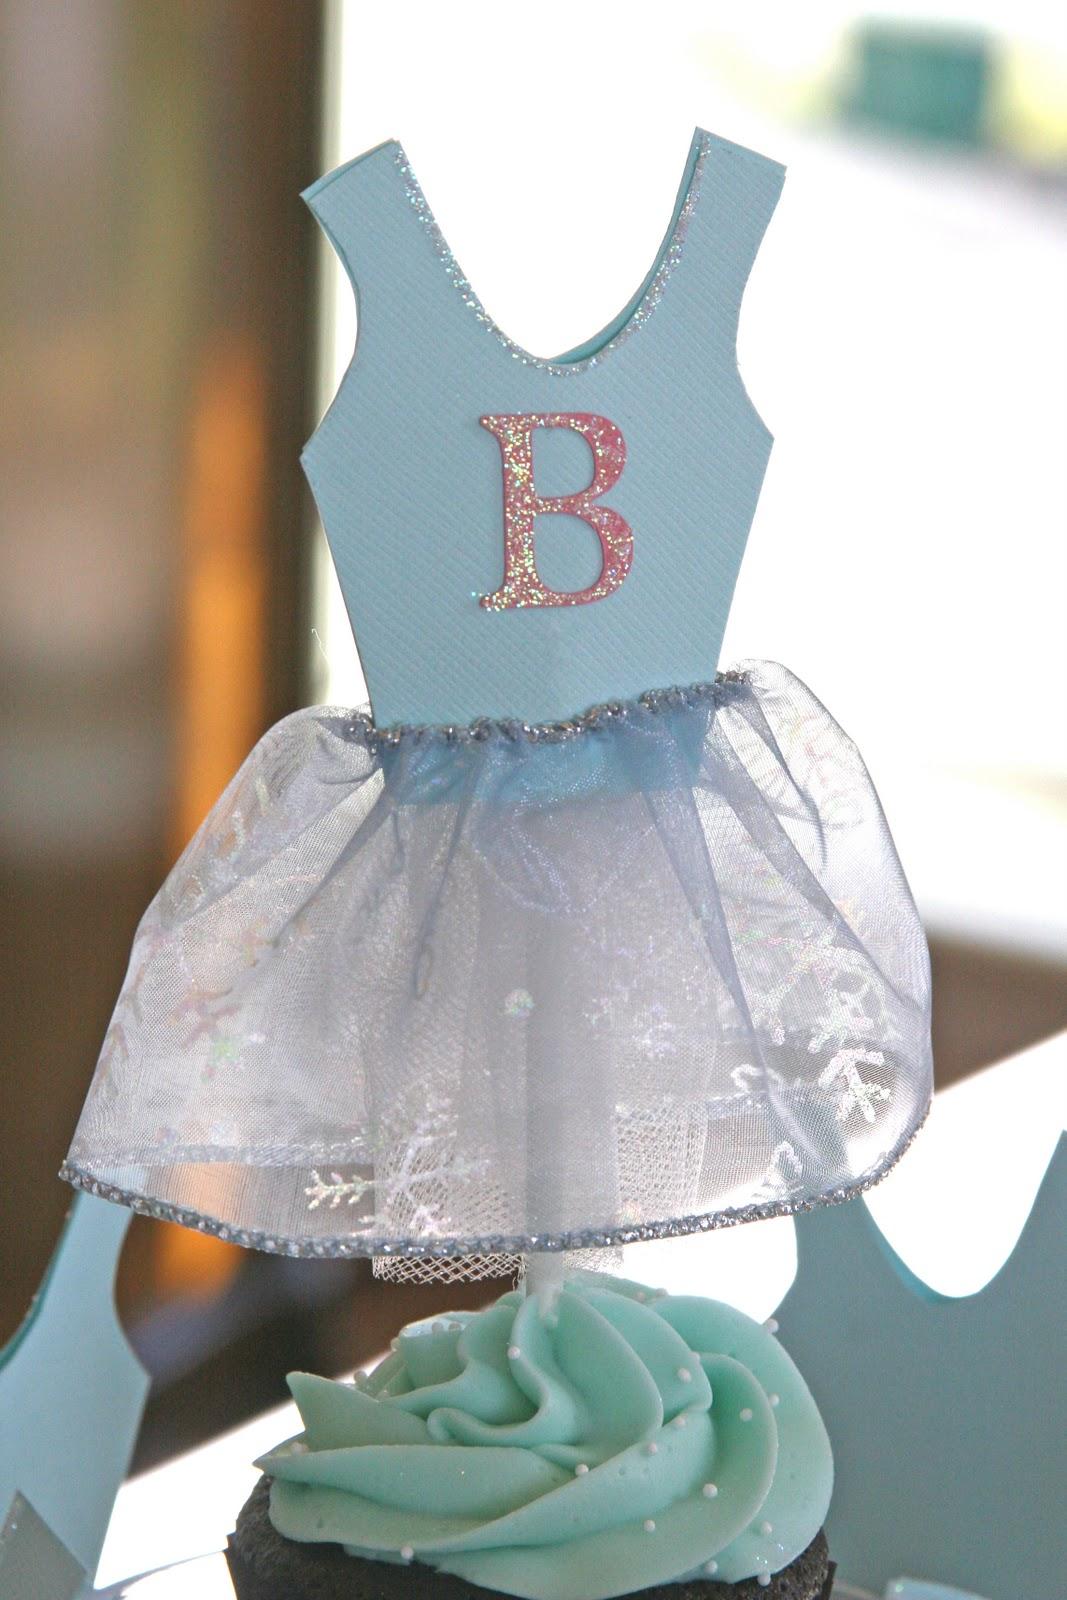 Snowflake Ballerina Party {A look back} – Glorious Treats